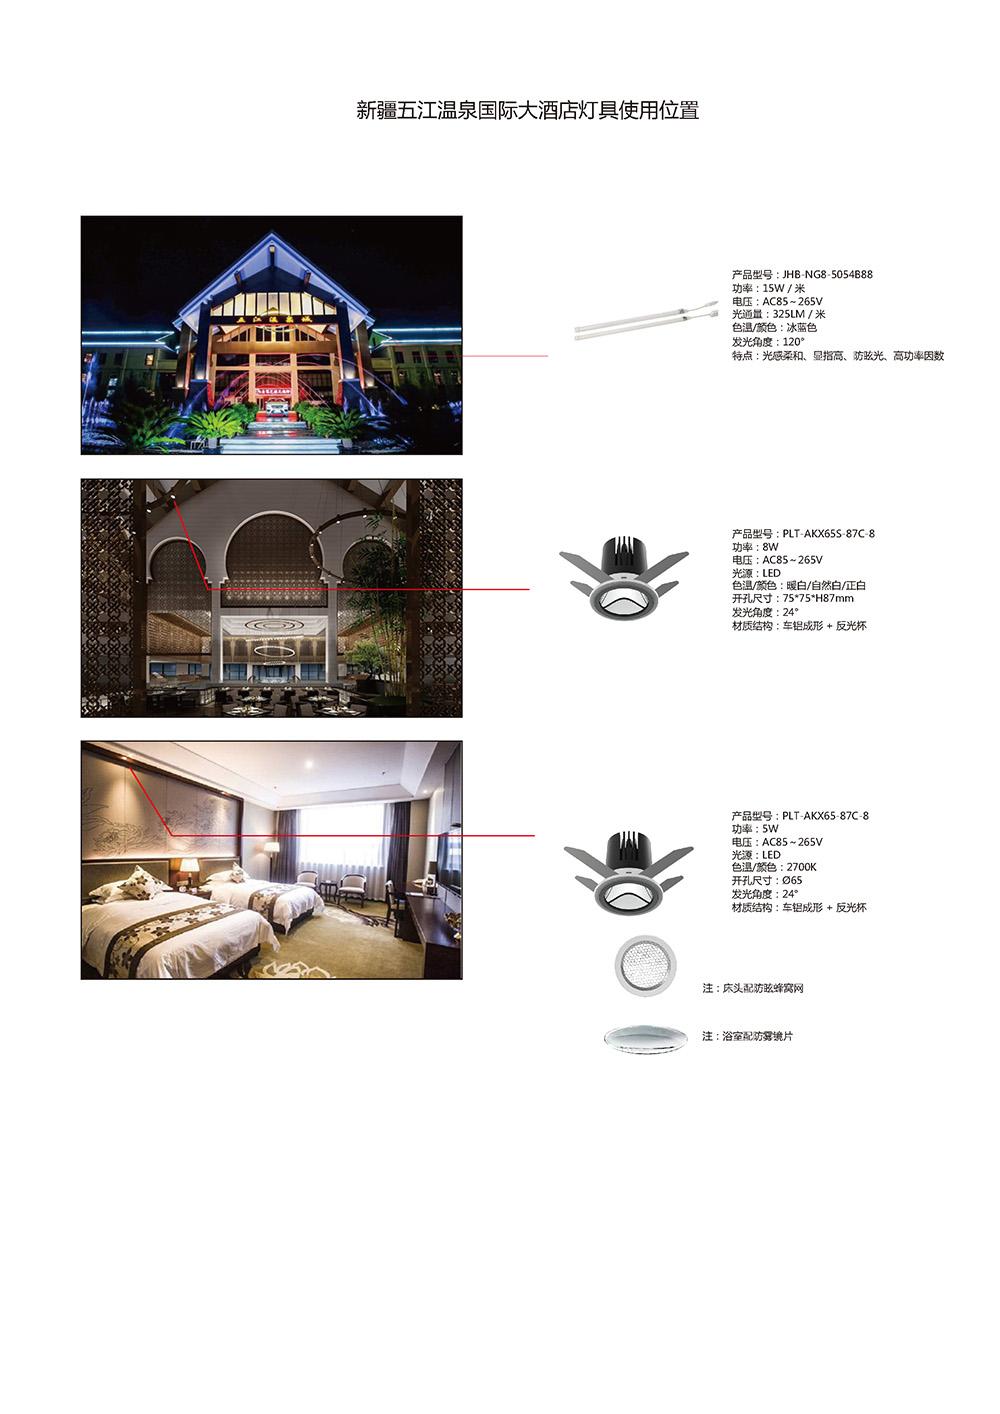 JPEG-8新疆五江温泉国际大年夜酒店